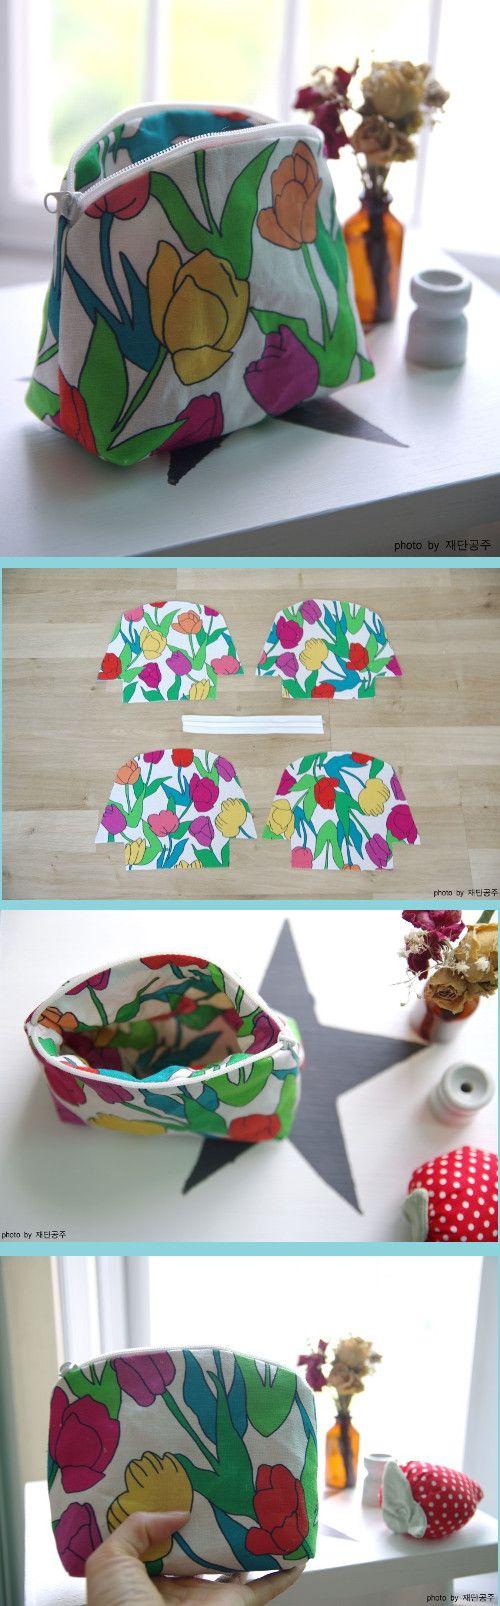 DIY small bag/wallet tutorial step to step. http://fastmade.blogspot.com/2016/12/blog-post.html